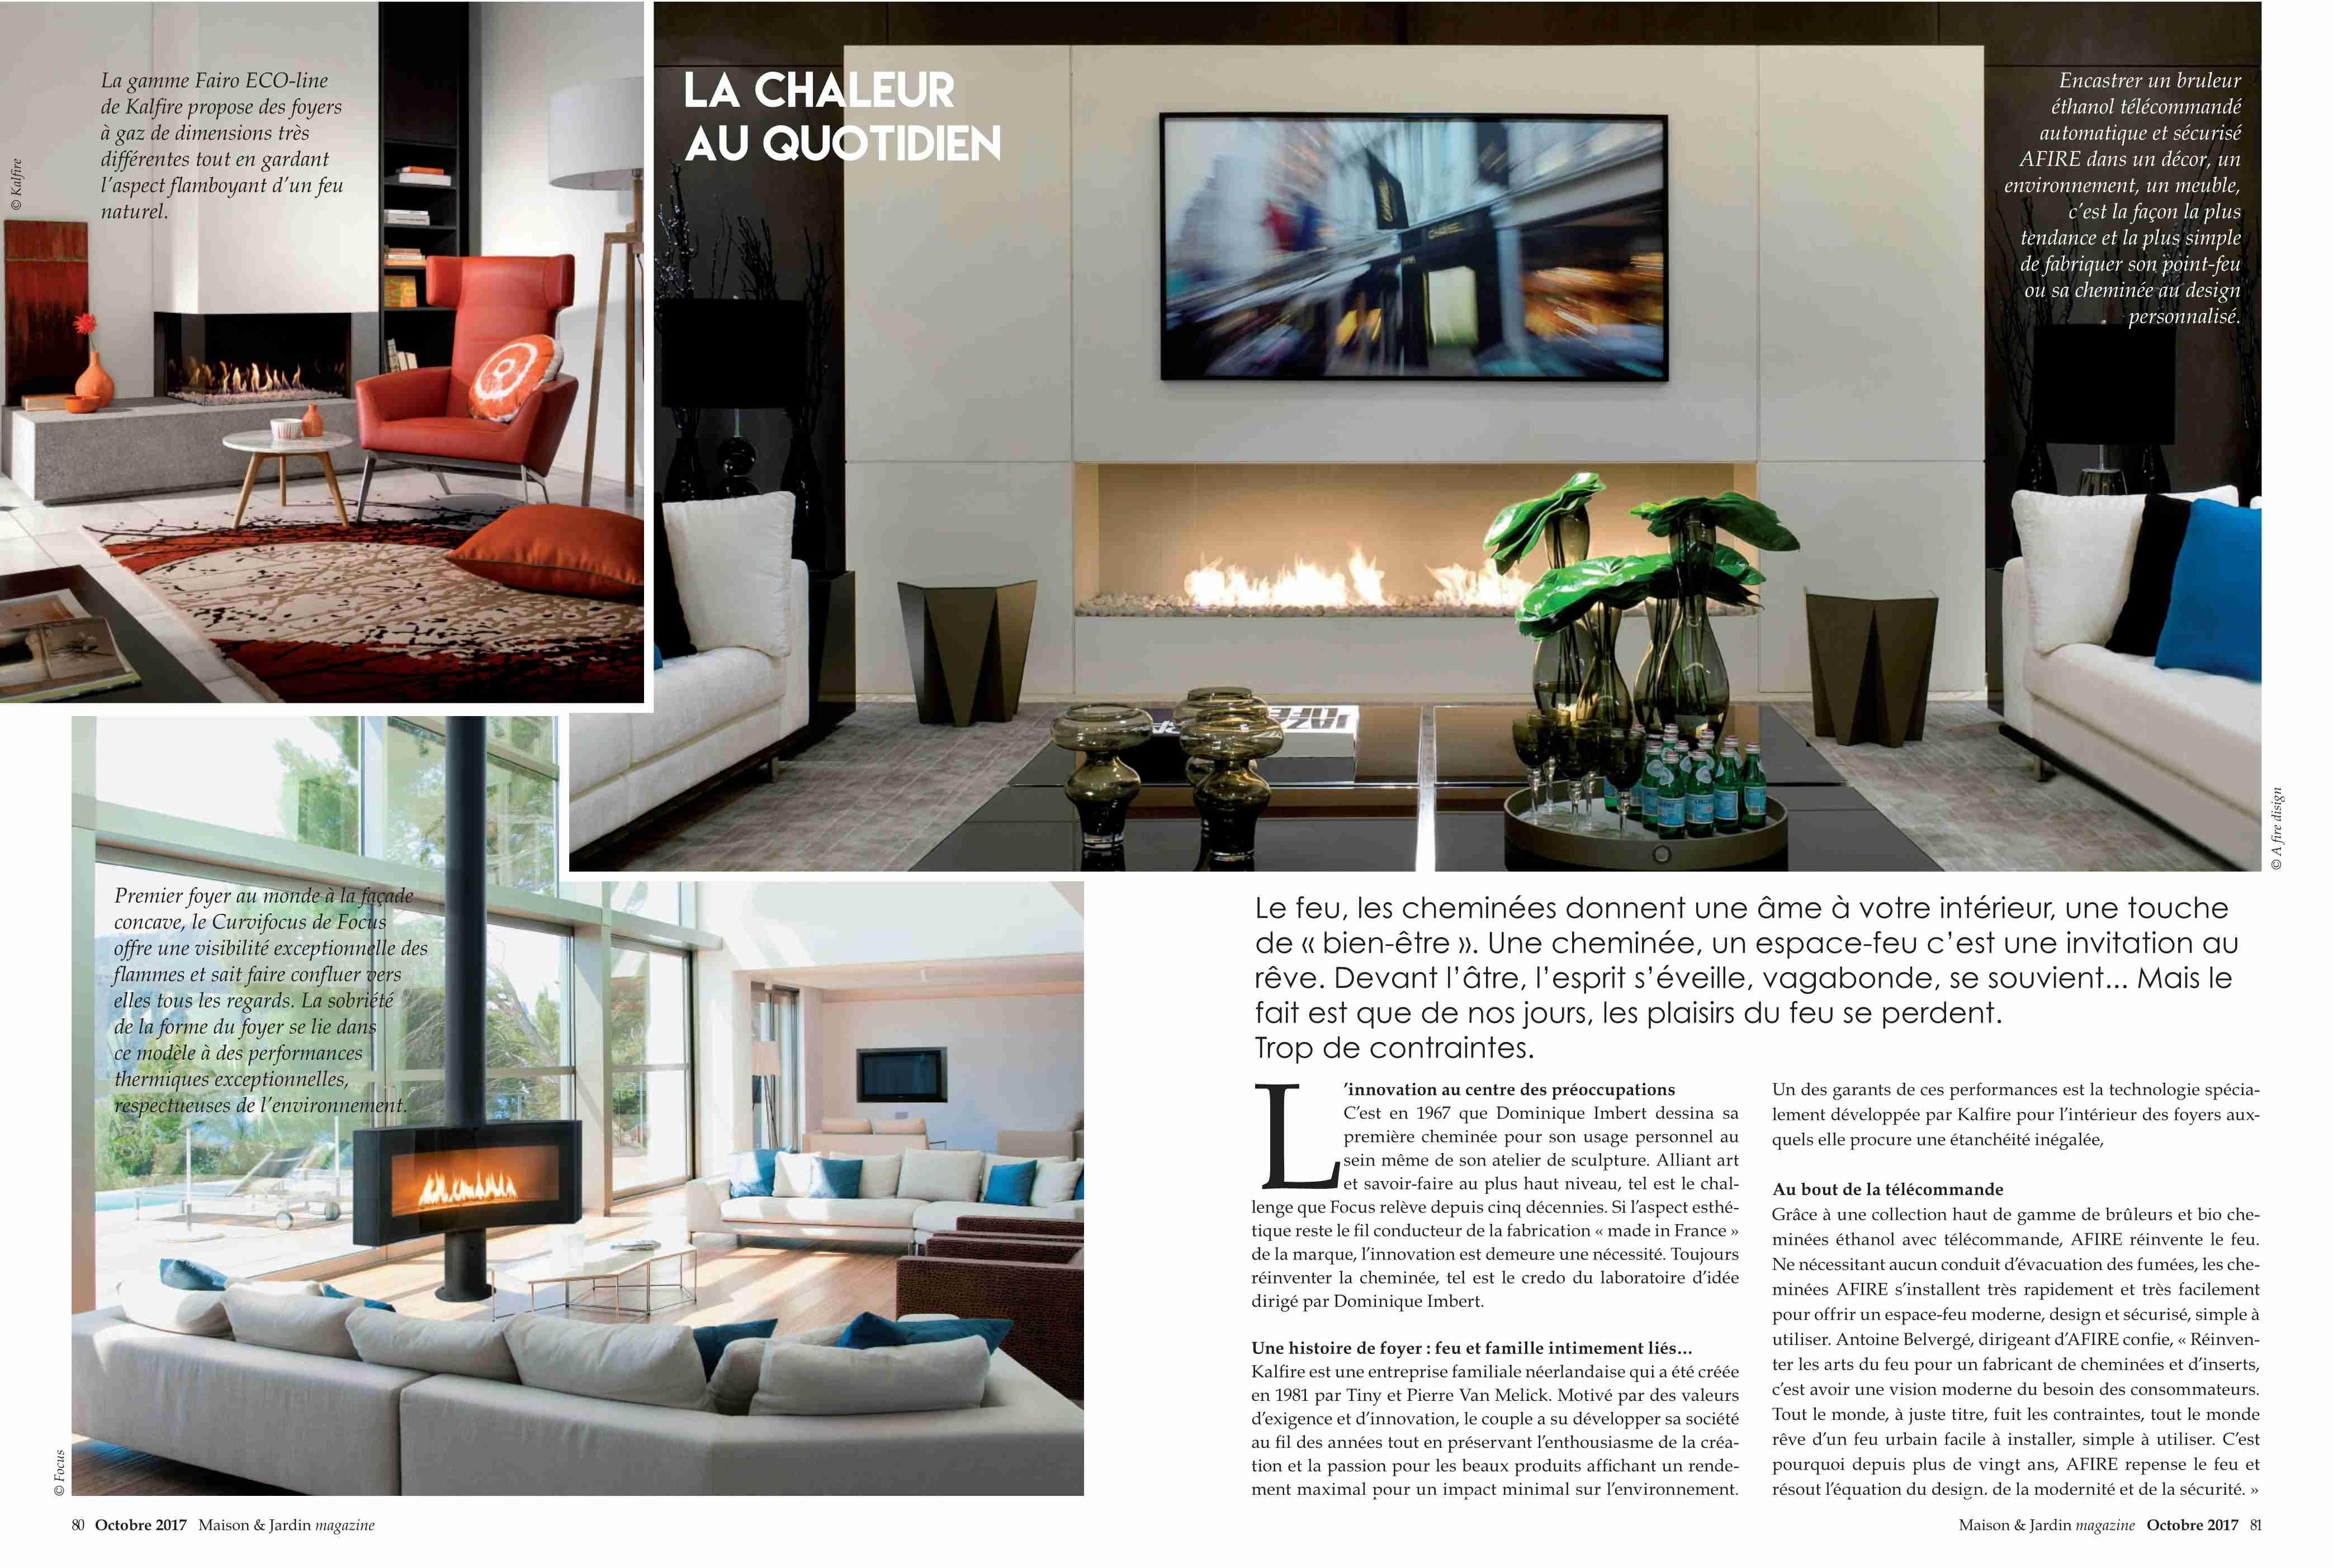 C Maison Et Jardin Magazine garden & home fireplace news 2017 ethanol fireplaces